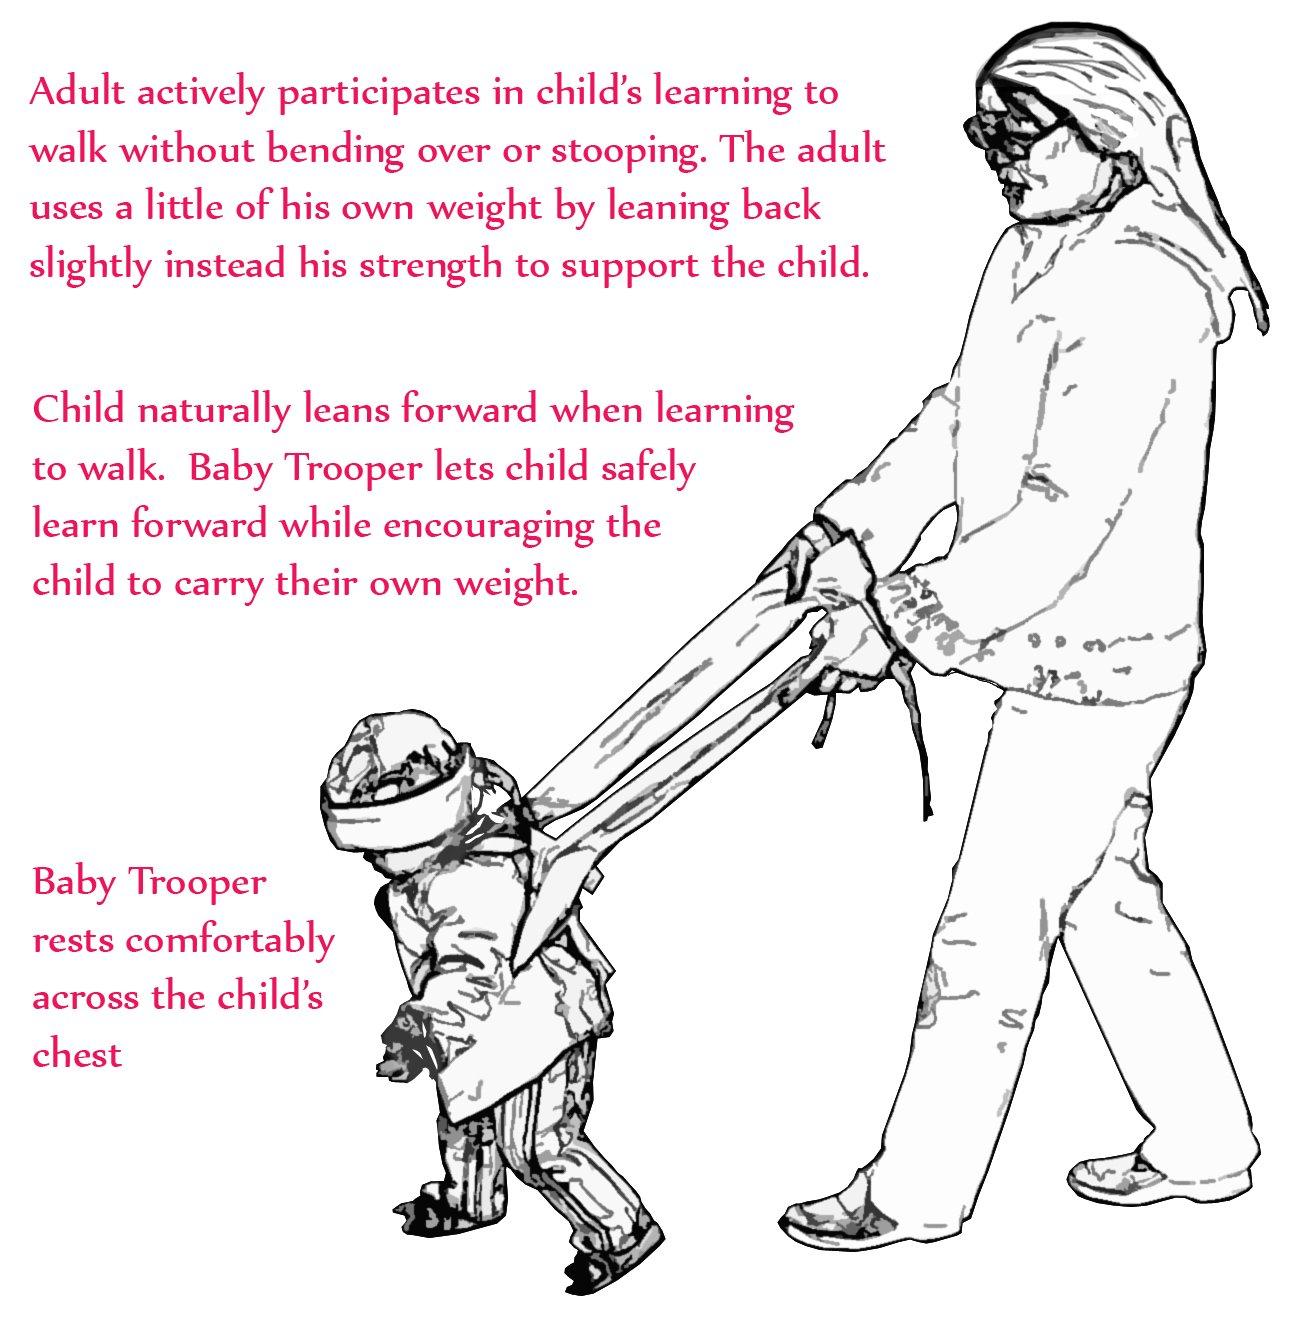 Baby Trooper Multi-use Baby Walking Harness (Aqua Blue)